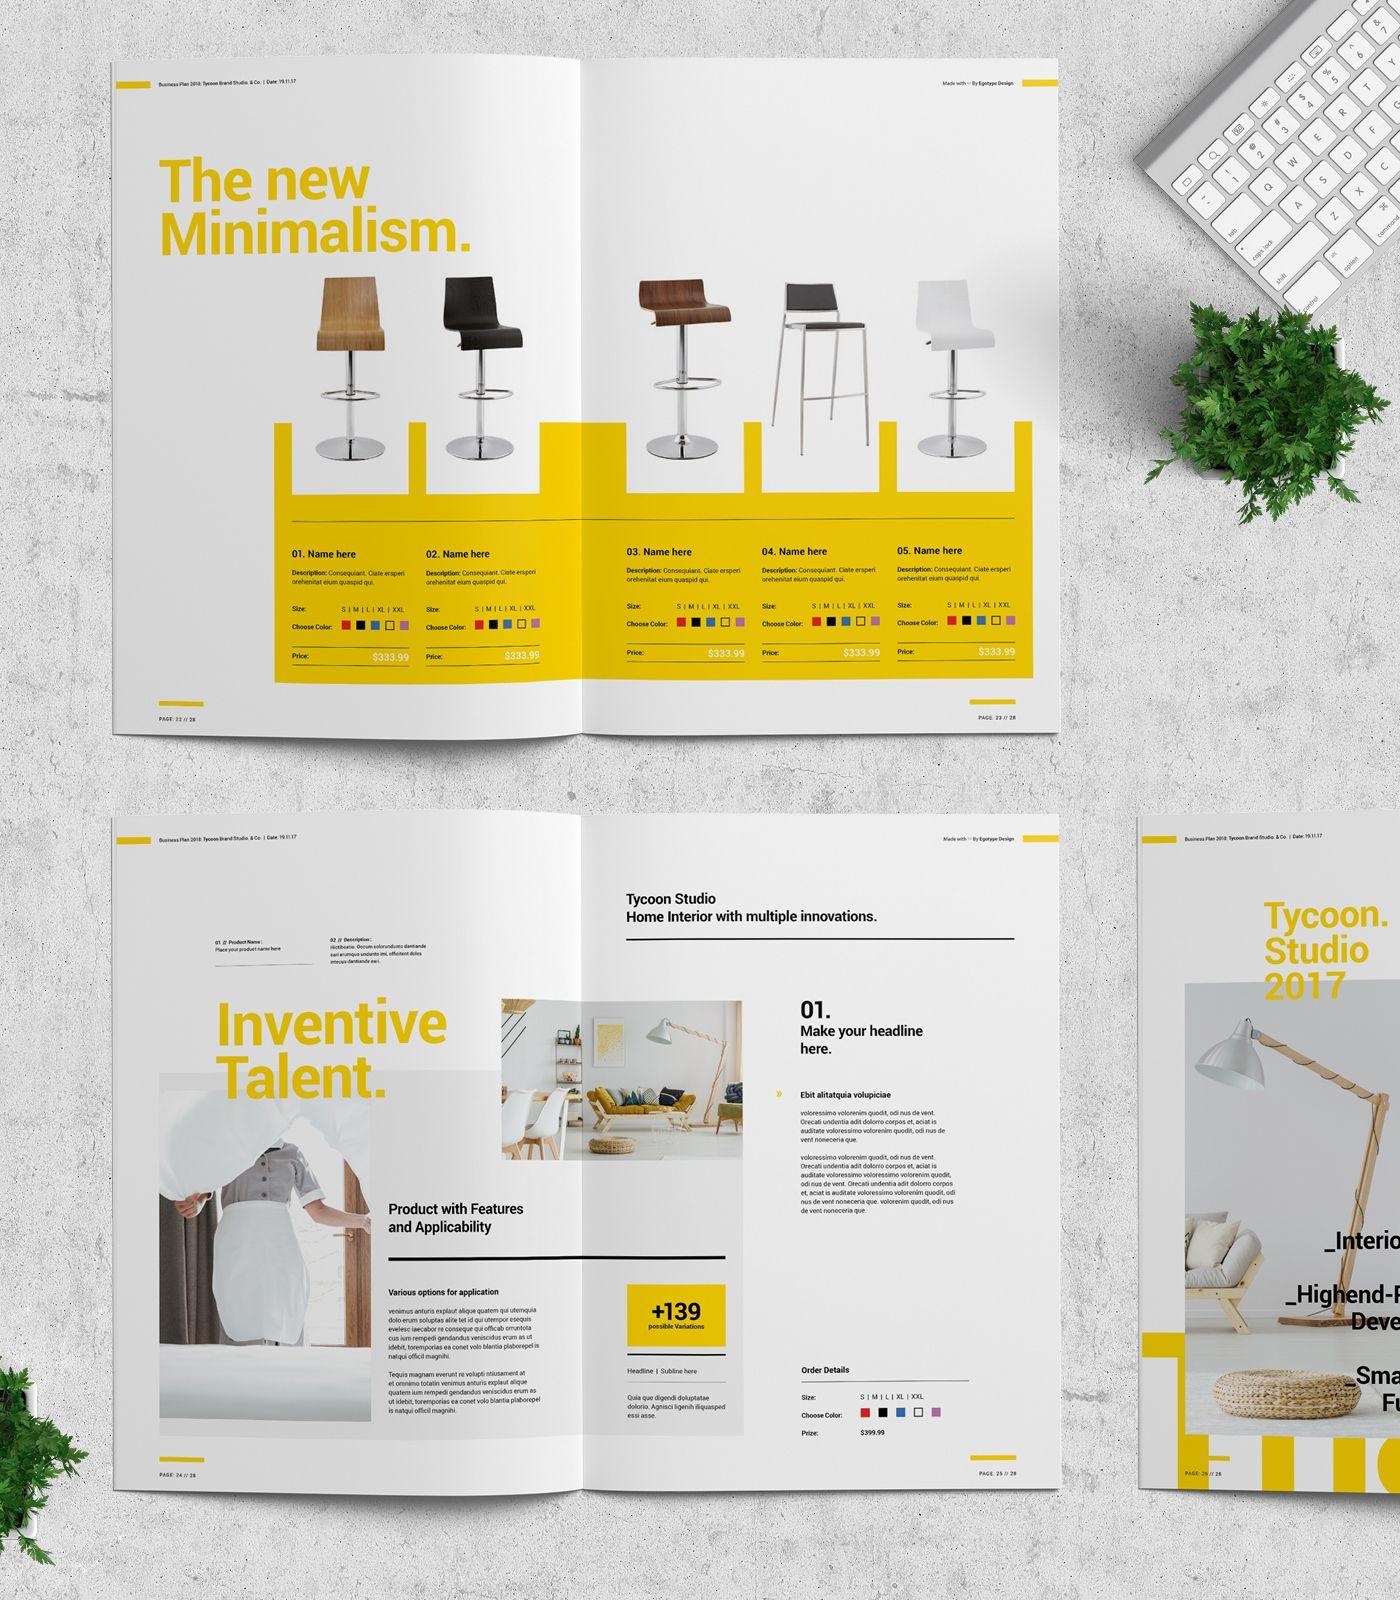 Product Catalog Brochure Template Coreldraw Alfaera Coreldraw Graphic Design Templates Brochure Template Product Catalog Template Graphic Design Templates